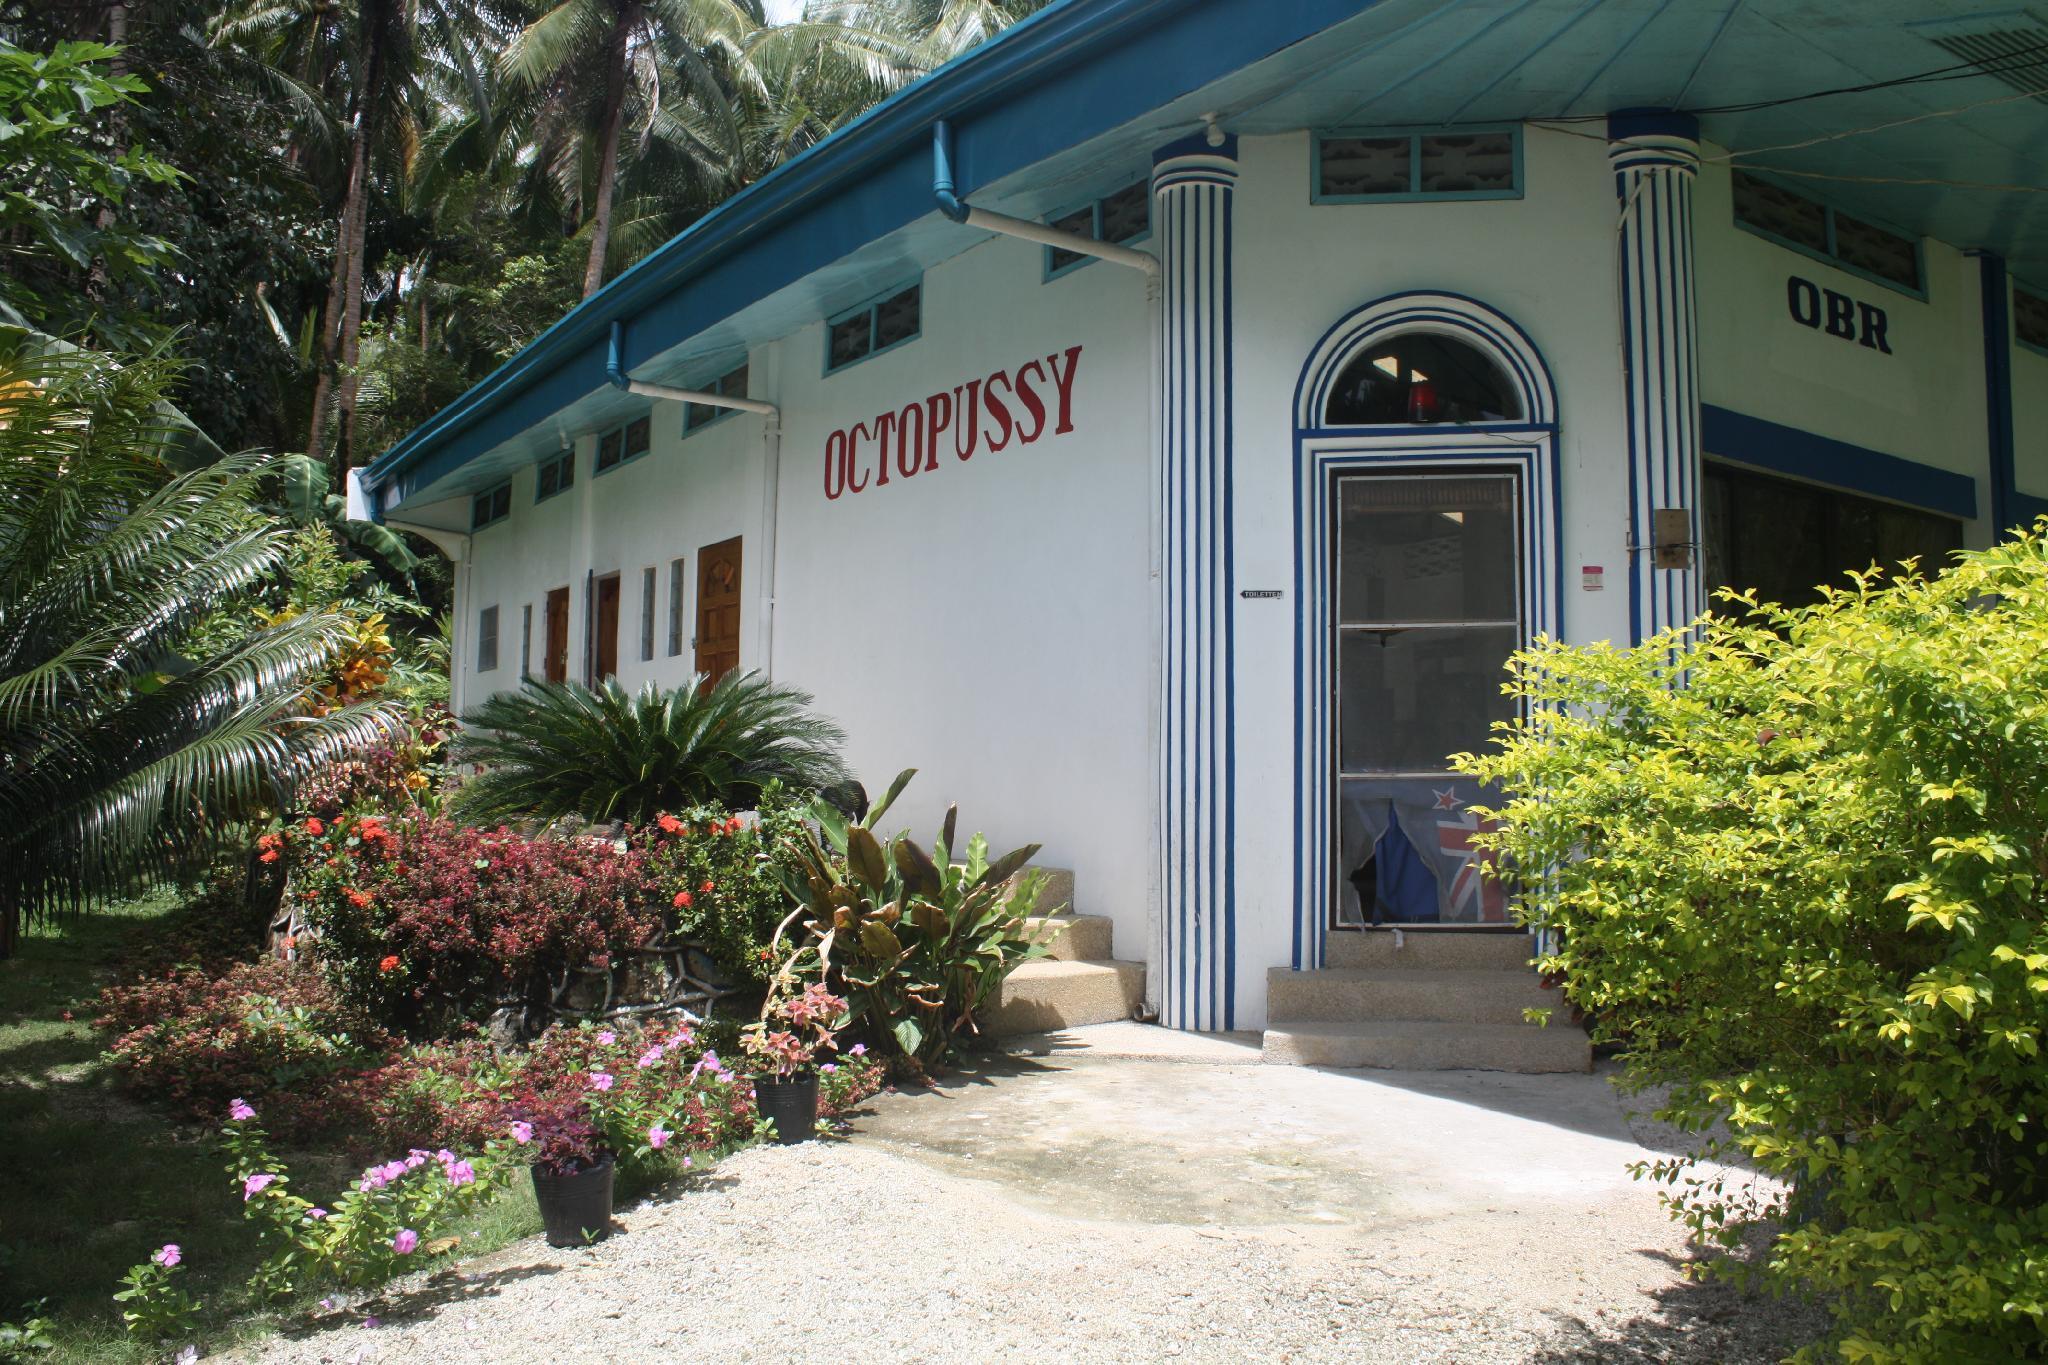 Octopussy Bungalow Beach Resort